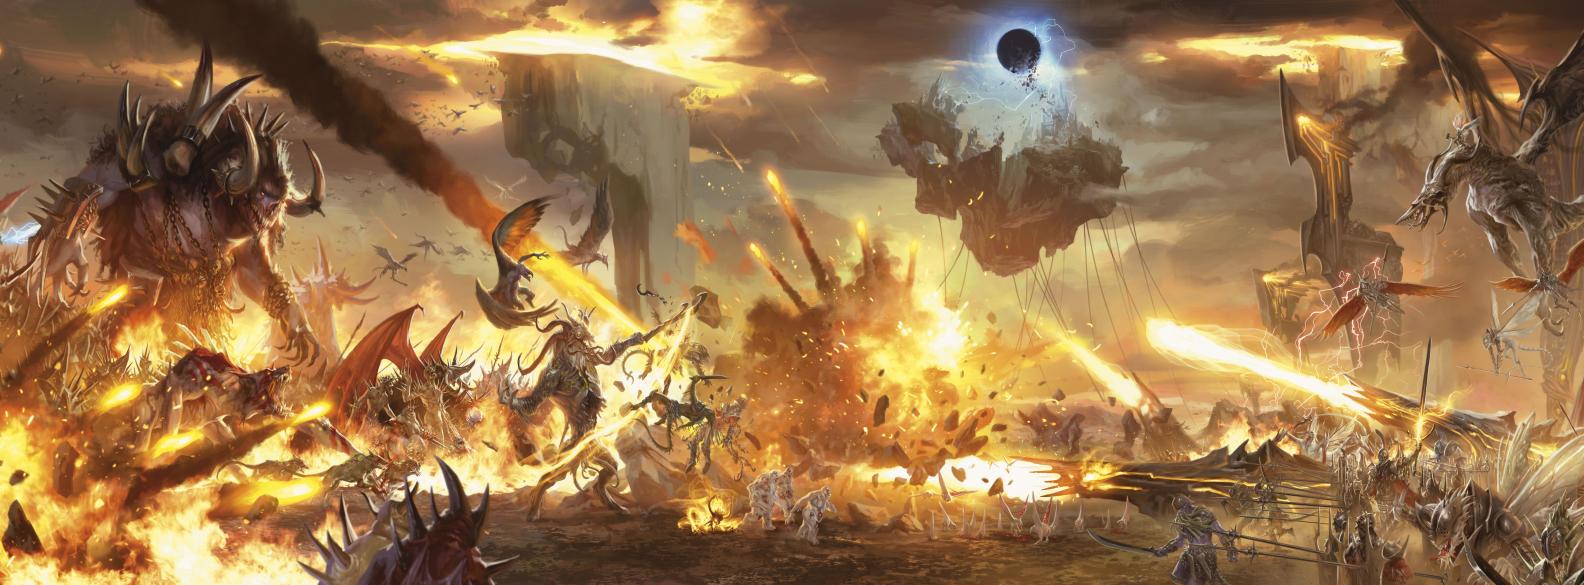 Reseña D&D - Mordenkainen's Tome of Foes - La Guerra de Sangre